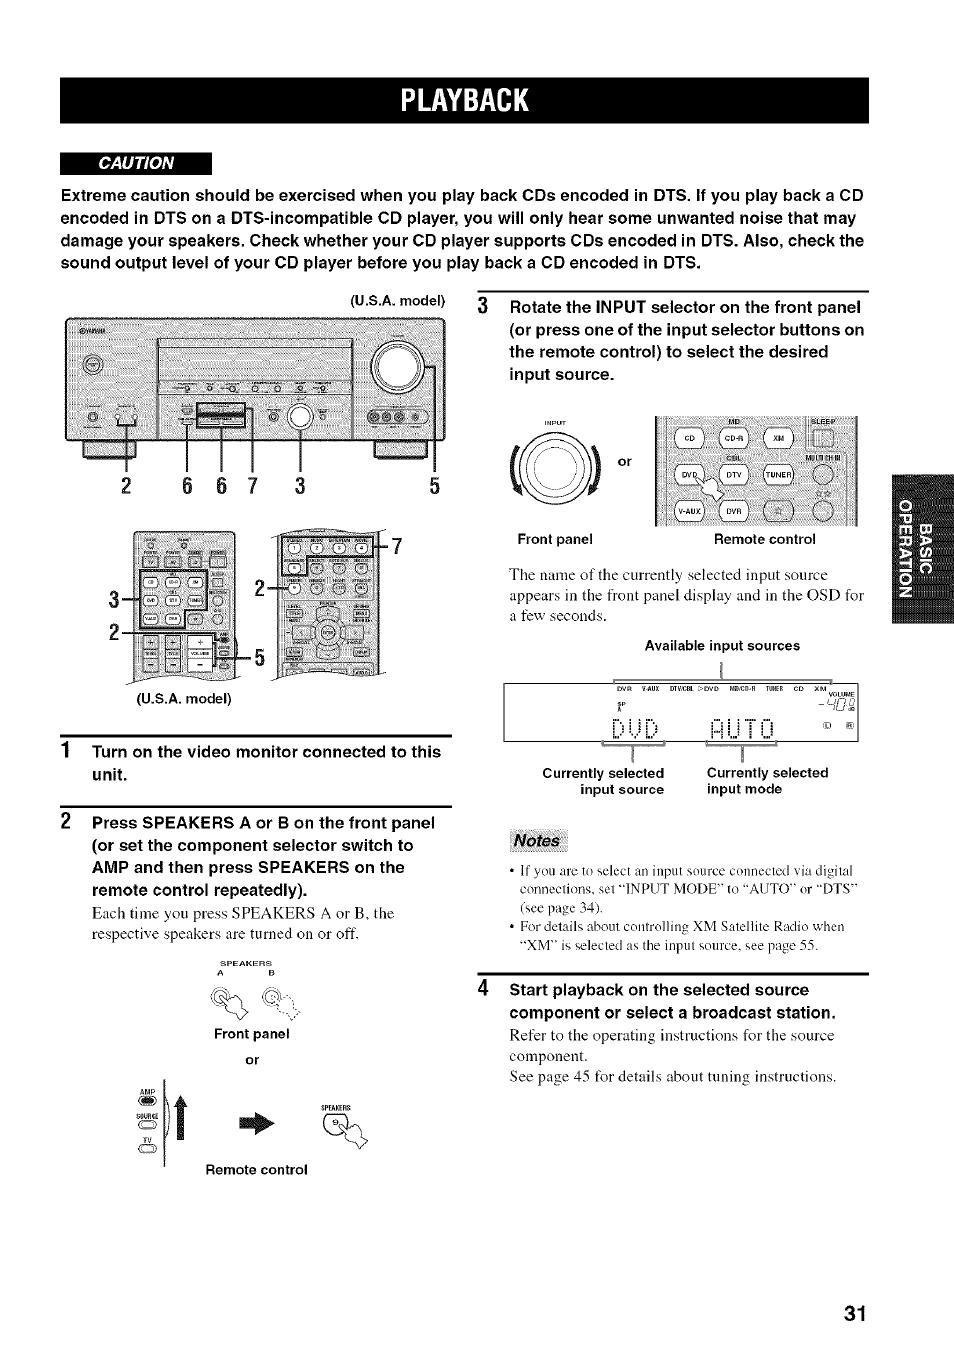 playback dud hutu yamaha htr 5950 user manual page 35 116 rh manualsdir com Yamaha HTR 4065 Manual yamaha htr 5950 manual